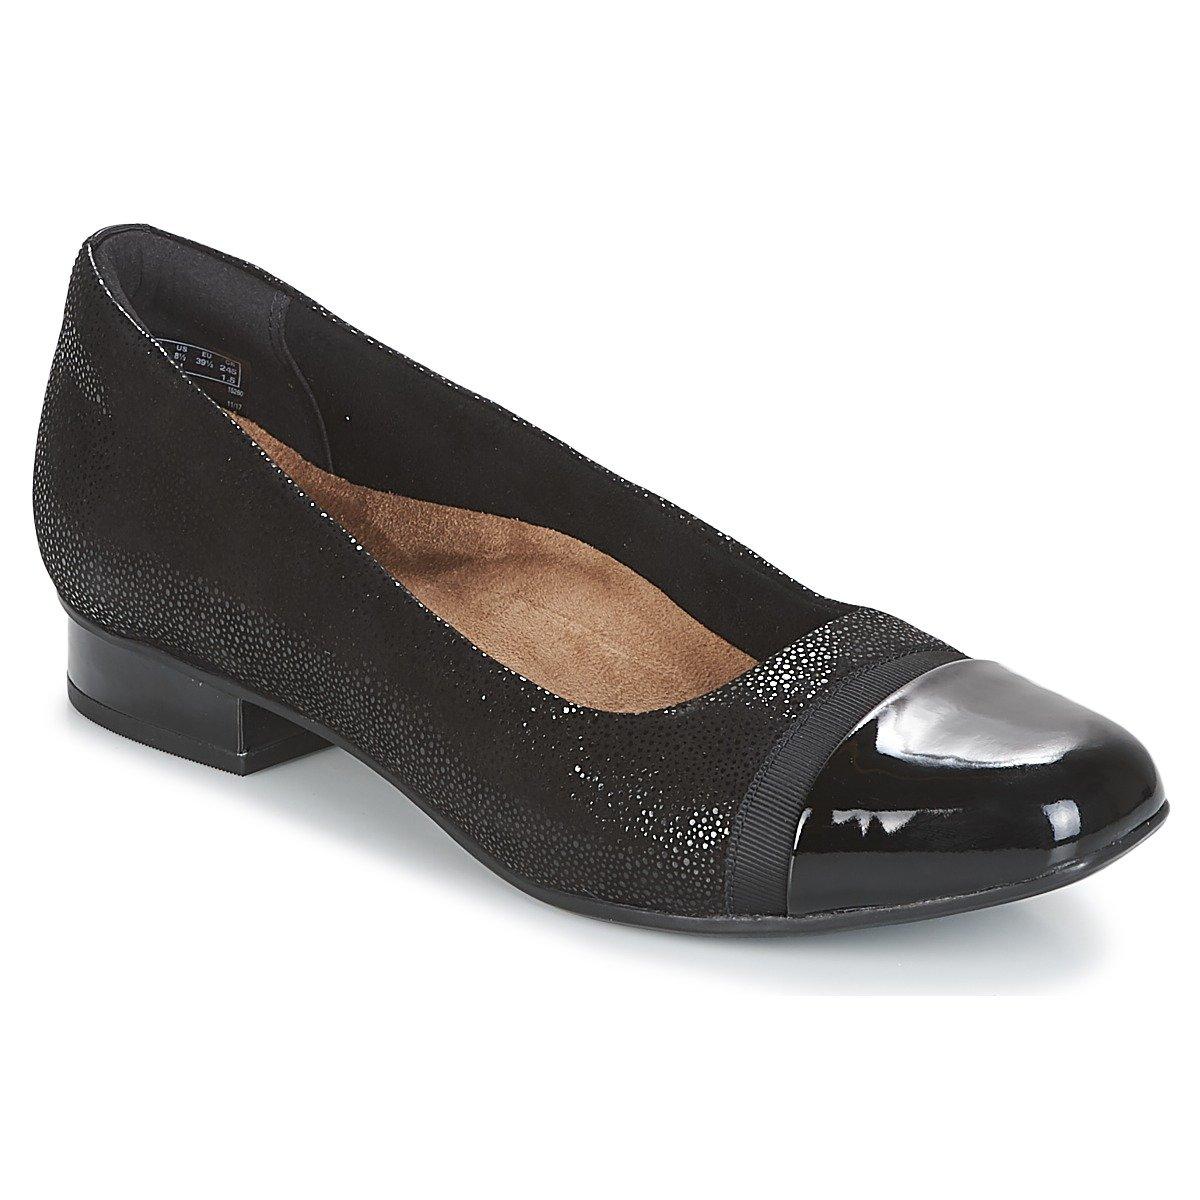 Clarks Keesha Zapatos Casuales De Mujer Rosa 42 EU|Black Interest